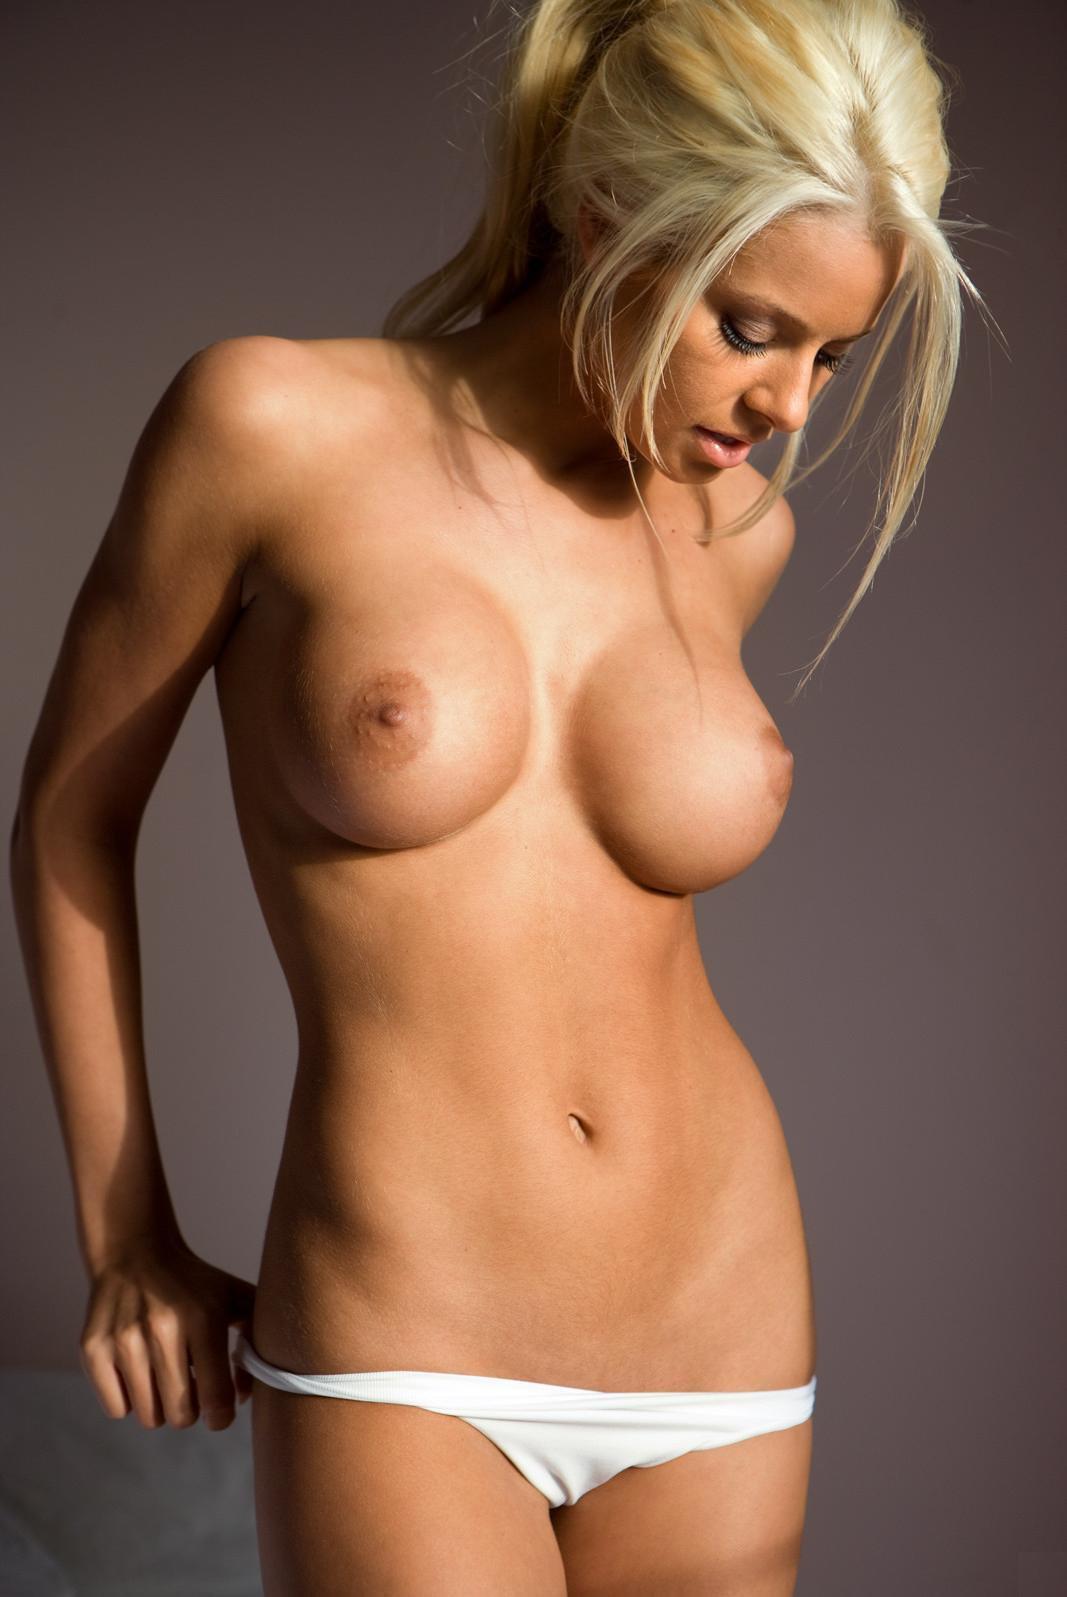 wwe-diva-girl-nude-images-anorectic-girls-fucking